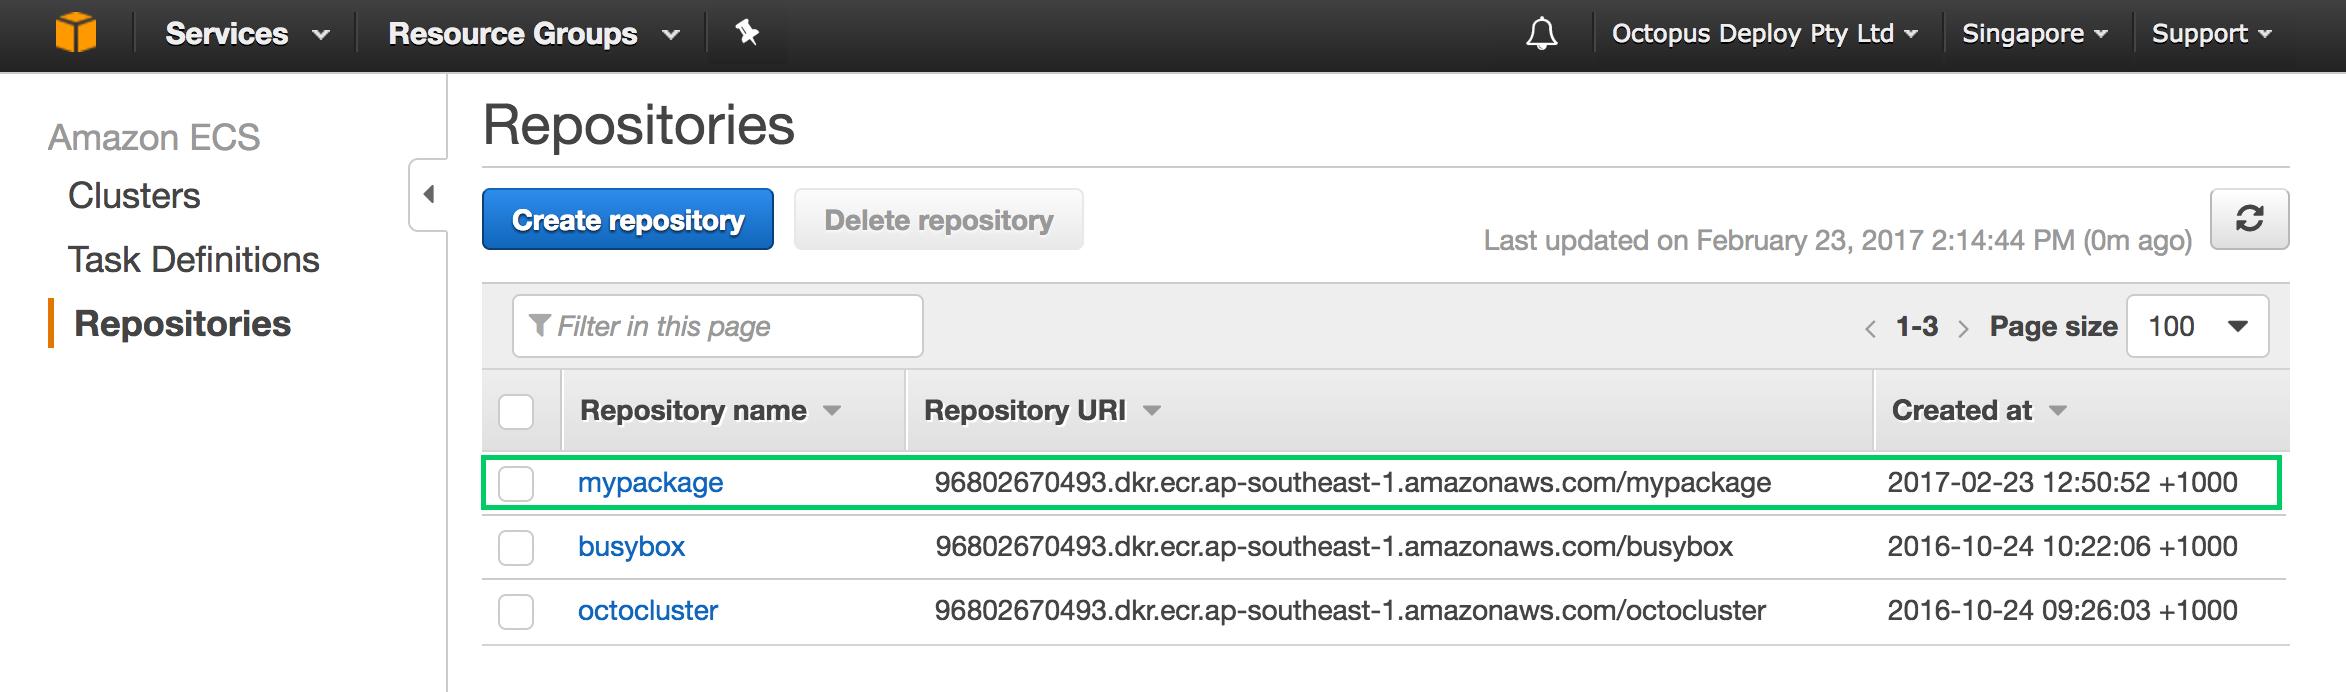 AWS Registries